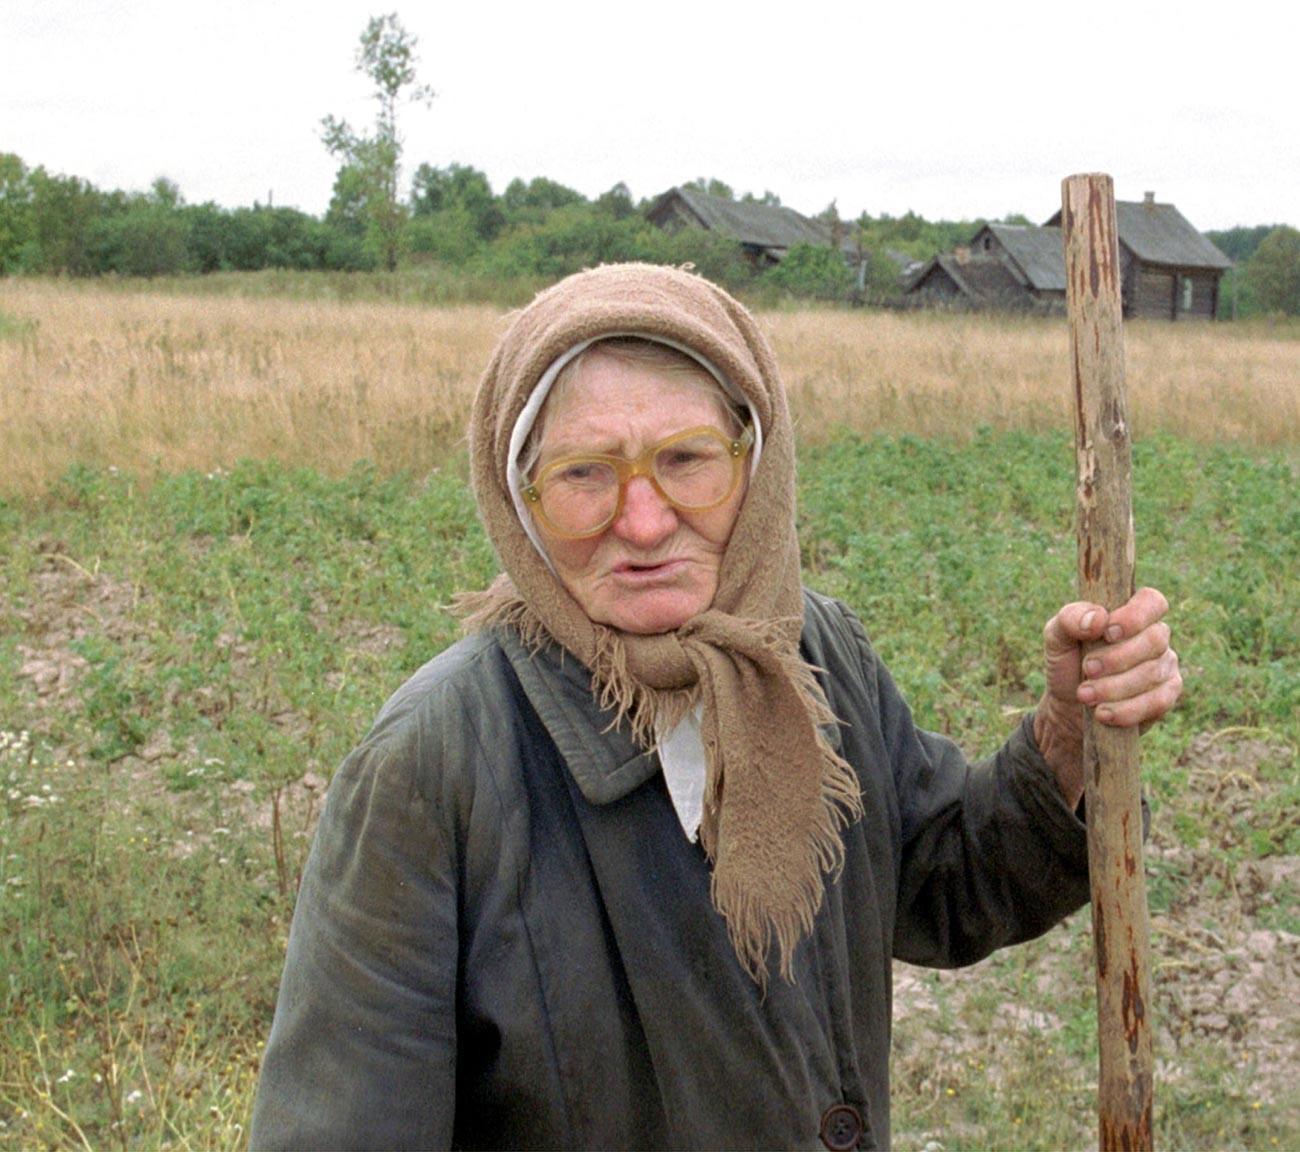 Ivanoskaya Oblast, 30 tahun setelah bencana.